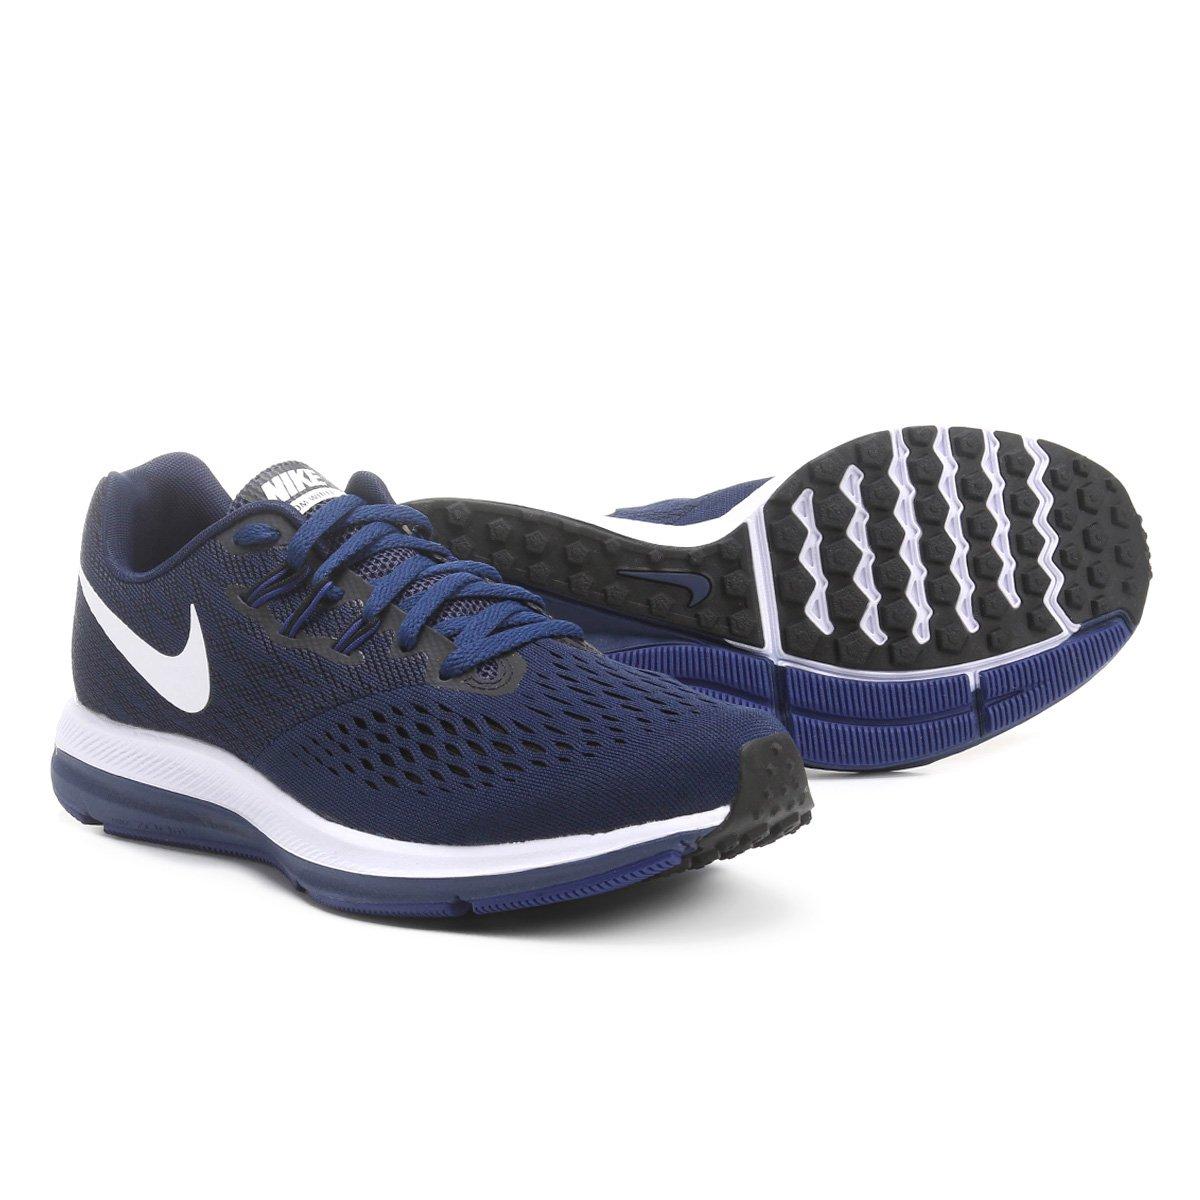 64fe21ac1 Tênis Nike Zoom Winflo 4 Masculino - Compre Agora